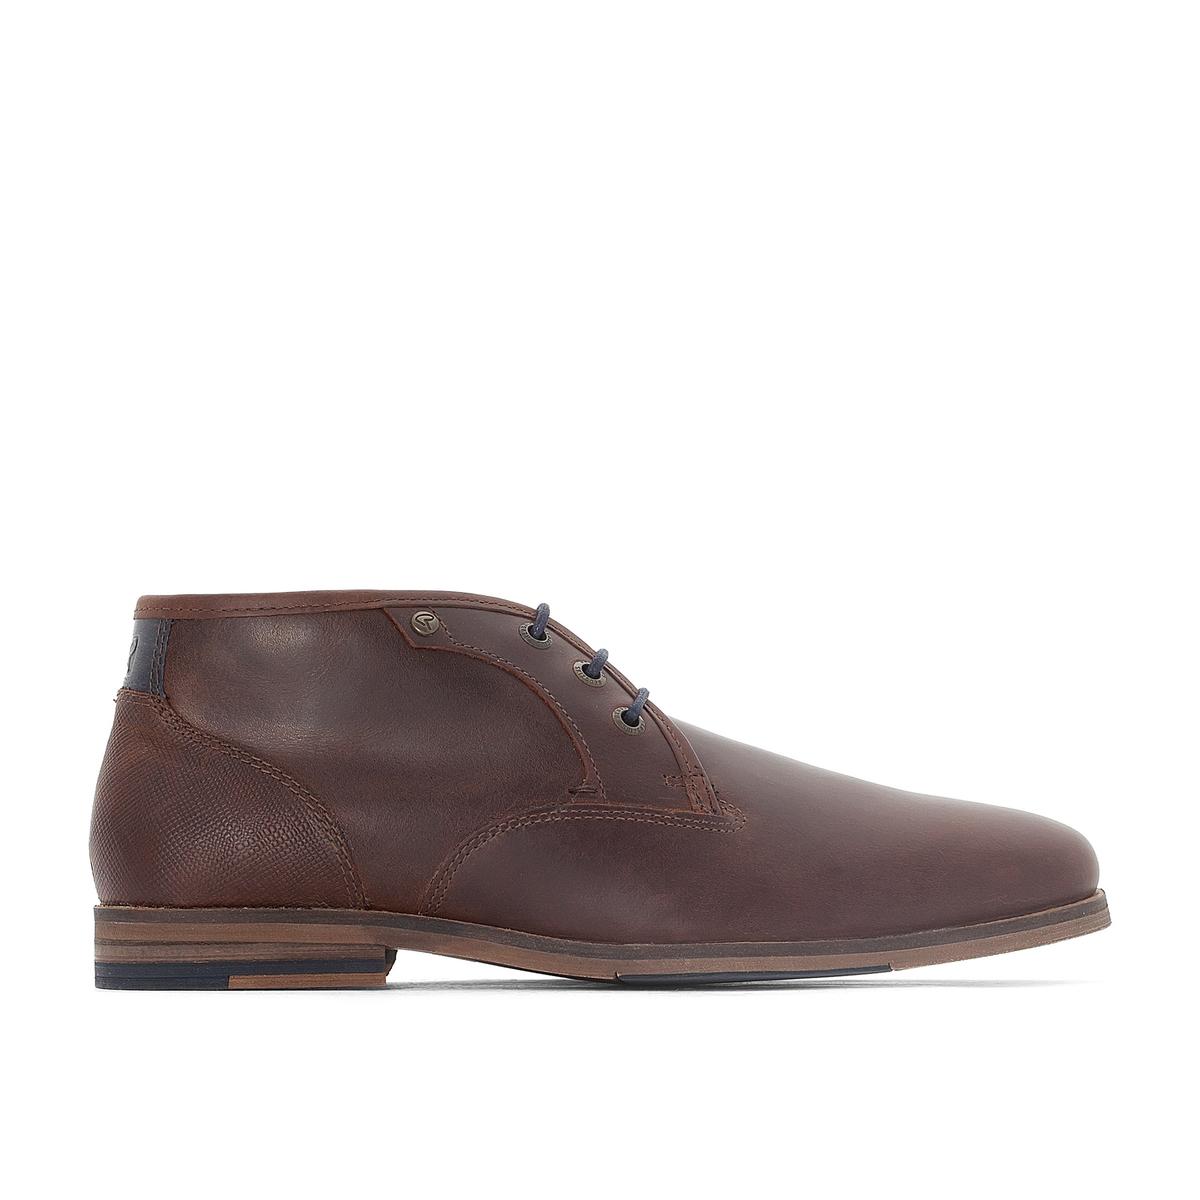 Ботинки-дезерты кожаные ALERTE multi